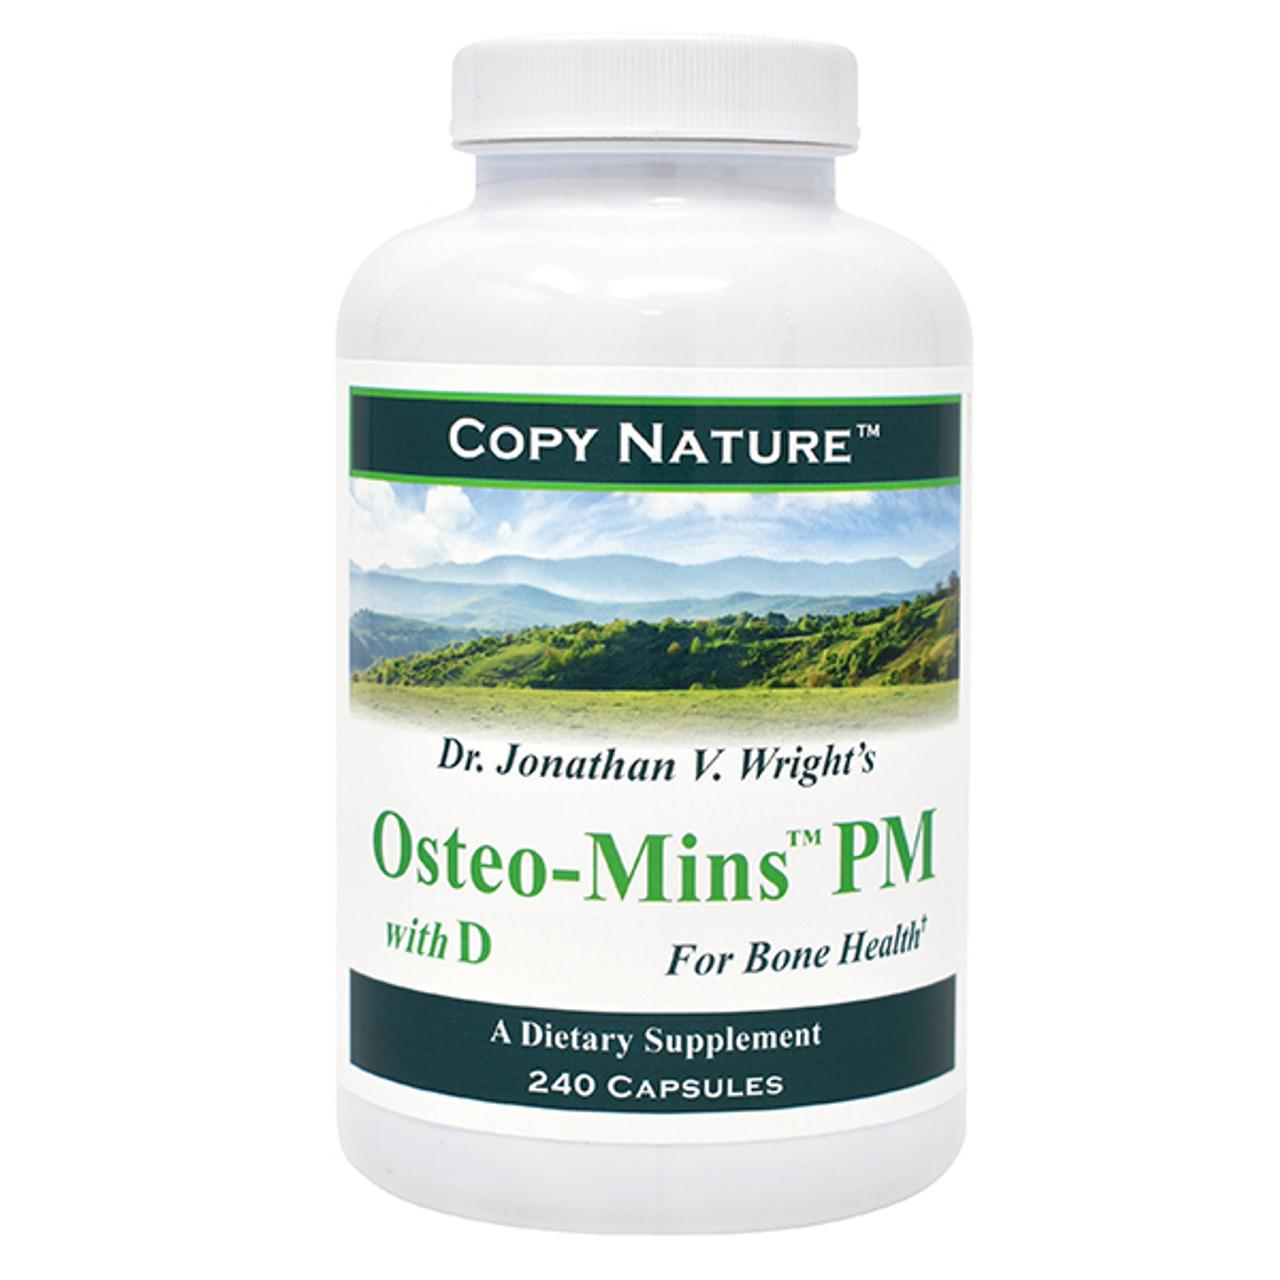 Osteo-Mins PM with Vitamin D 240 Caps